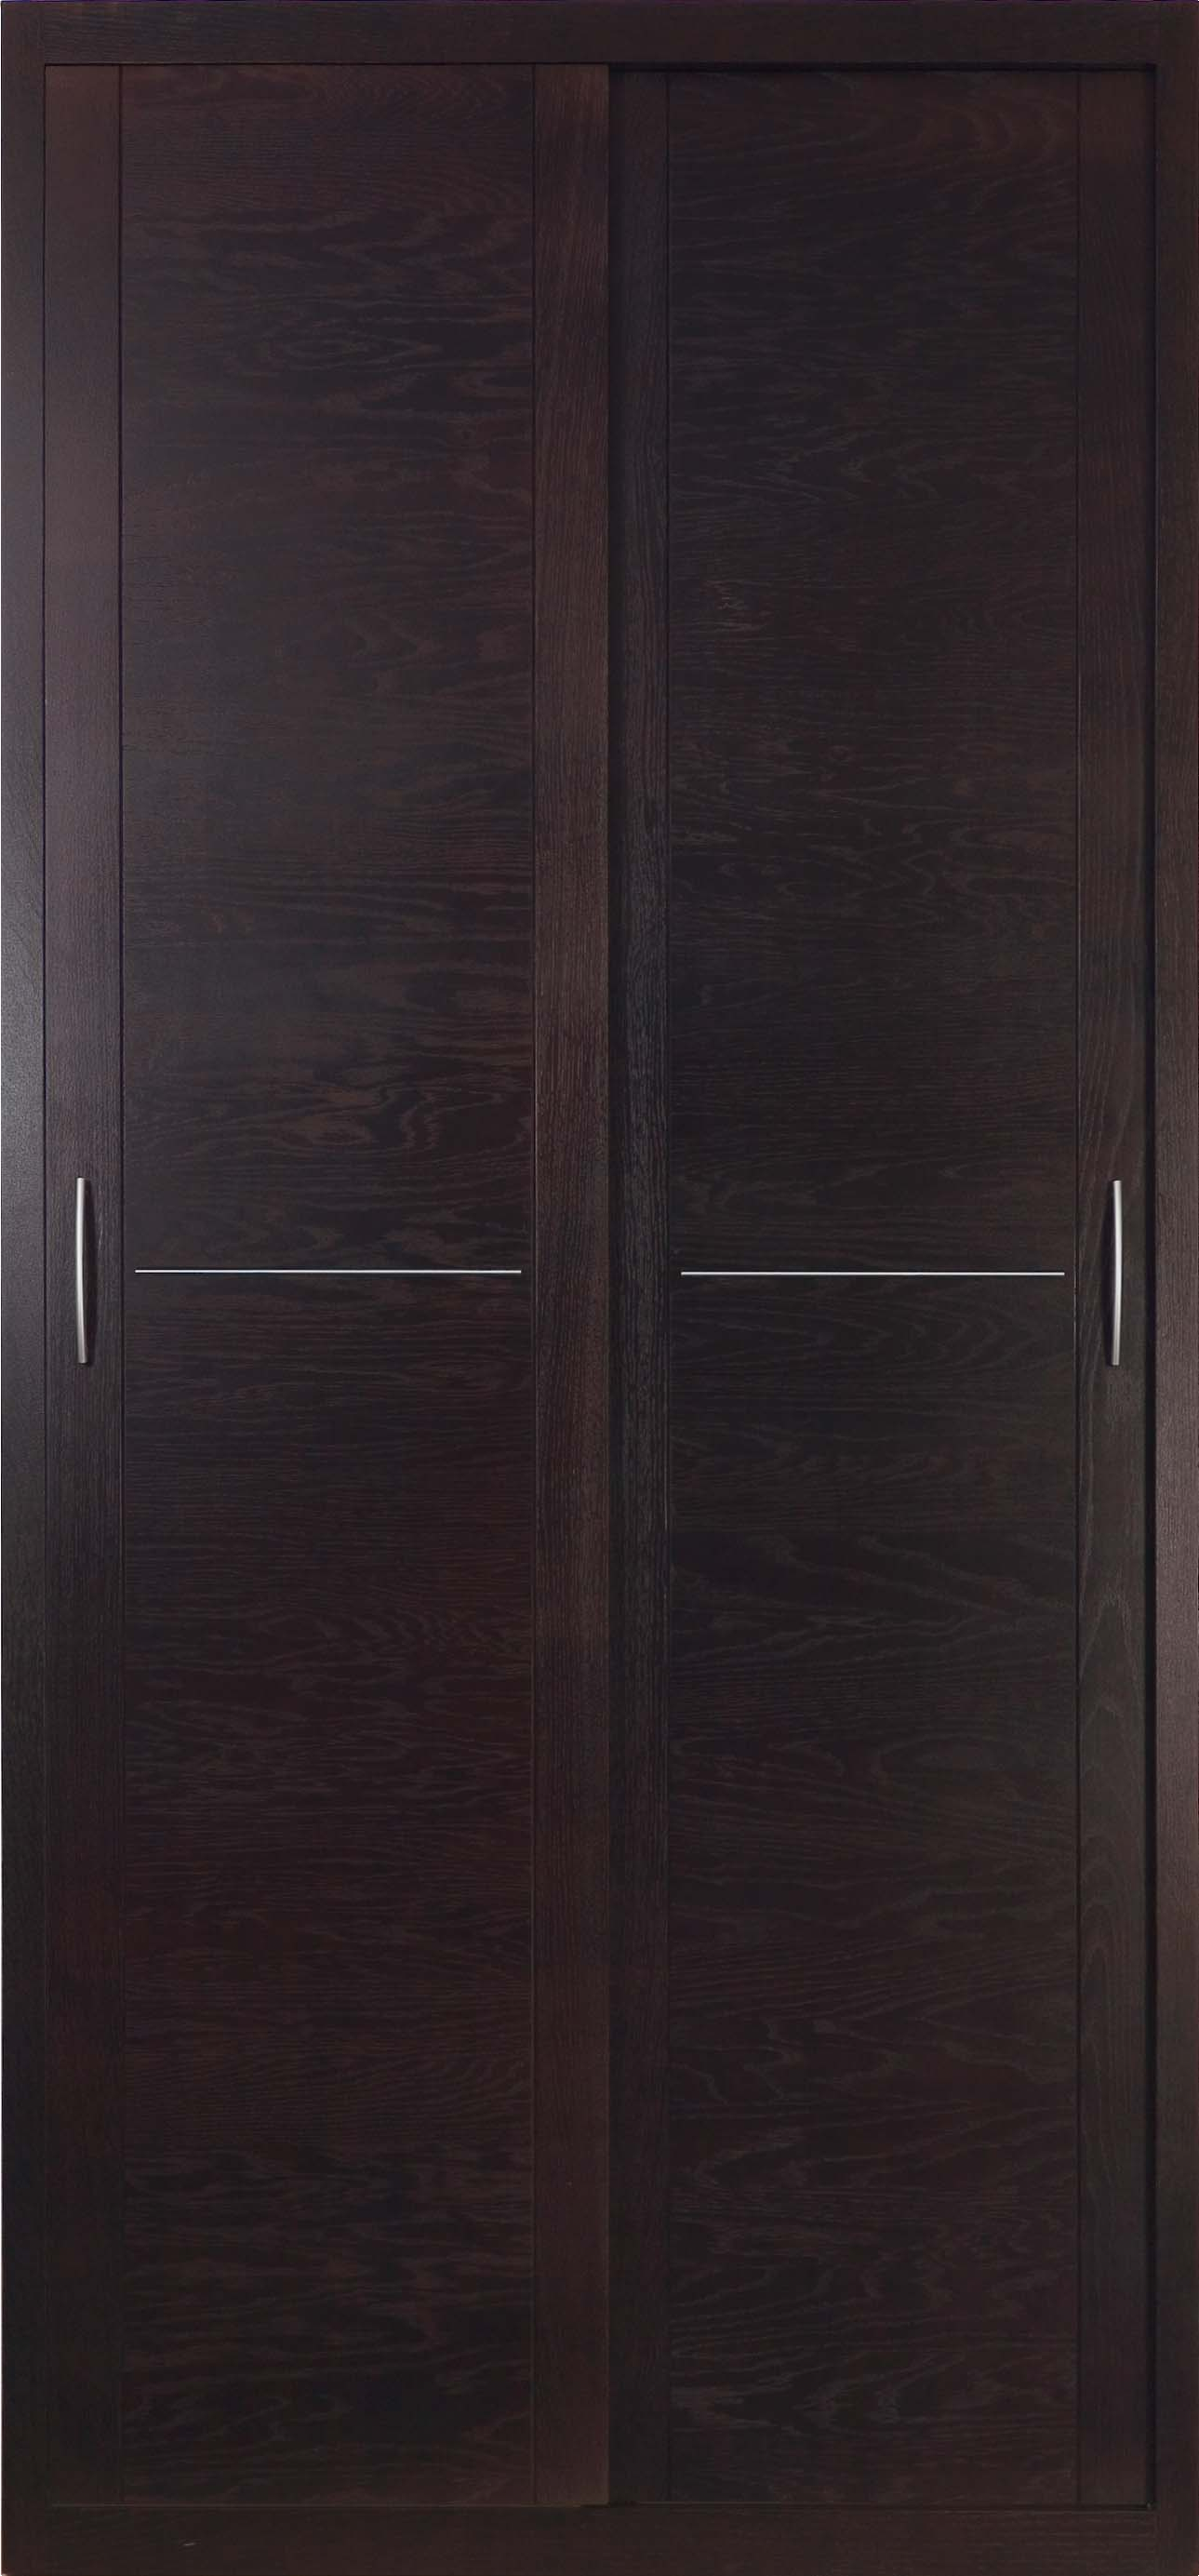 fa ade placard proboporte en ch ne teint weng mod le ines hue socoda n goces bois. Black Bedroom Furniture Sets. Home Design Ideas